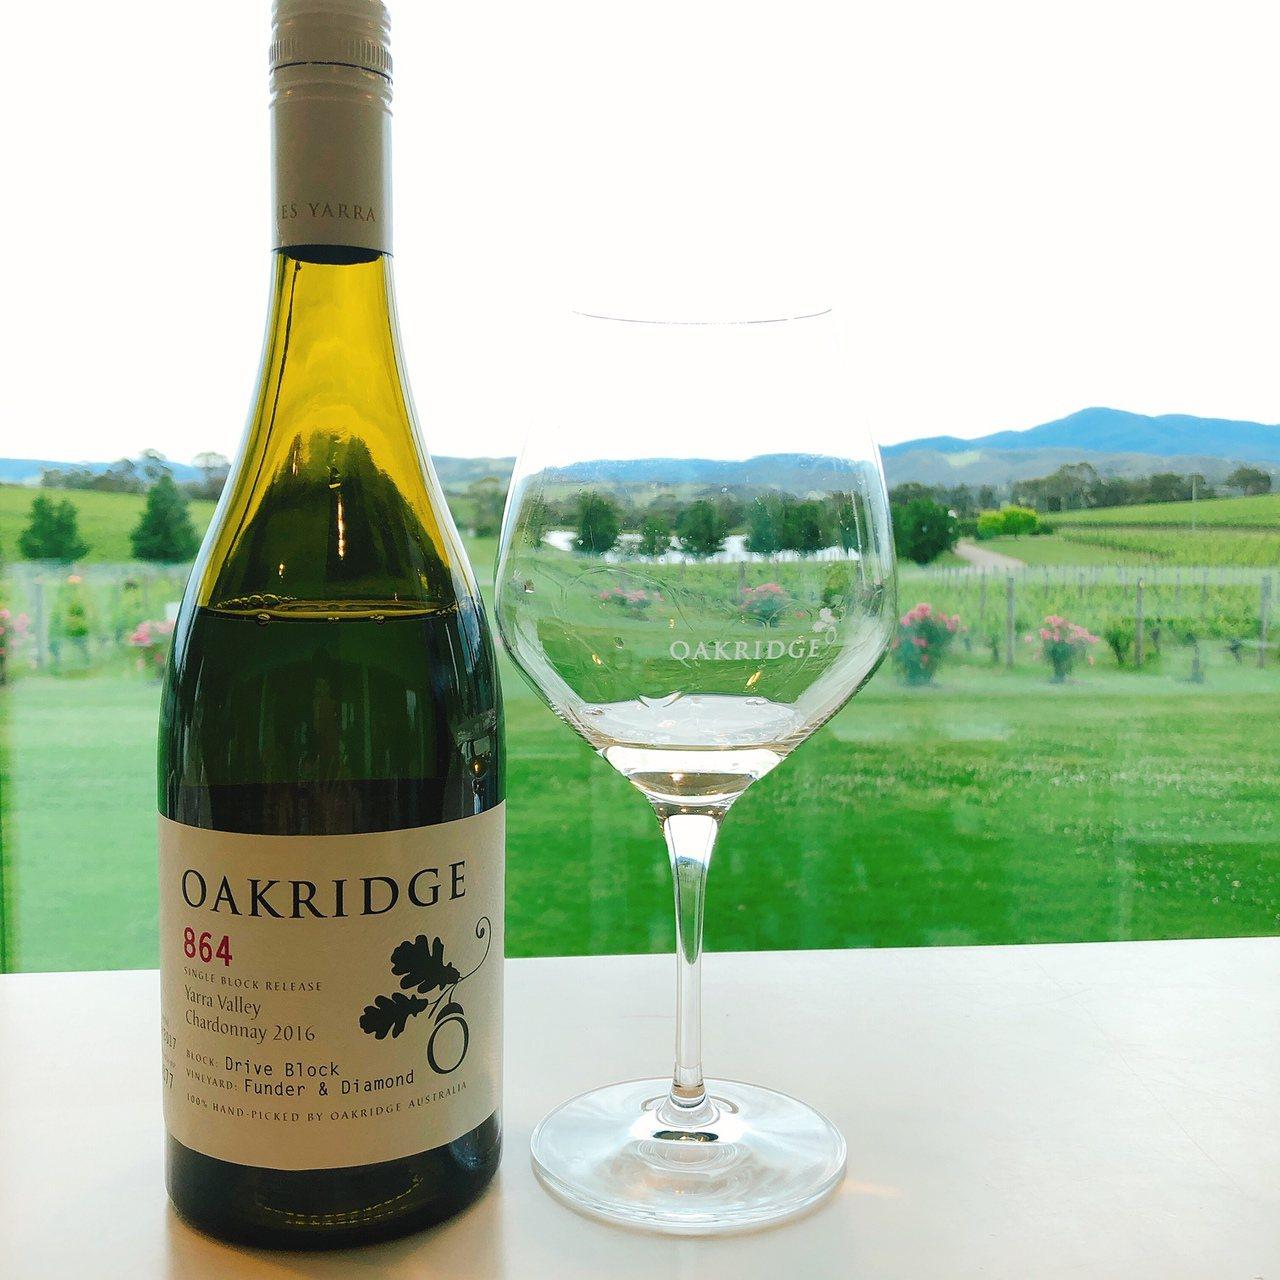 Oakridge酒莊品酒吧台望去,成排整齊葡萄樹與前導玫瑰。記者錢欽青攝影。...